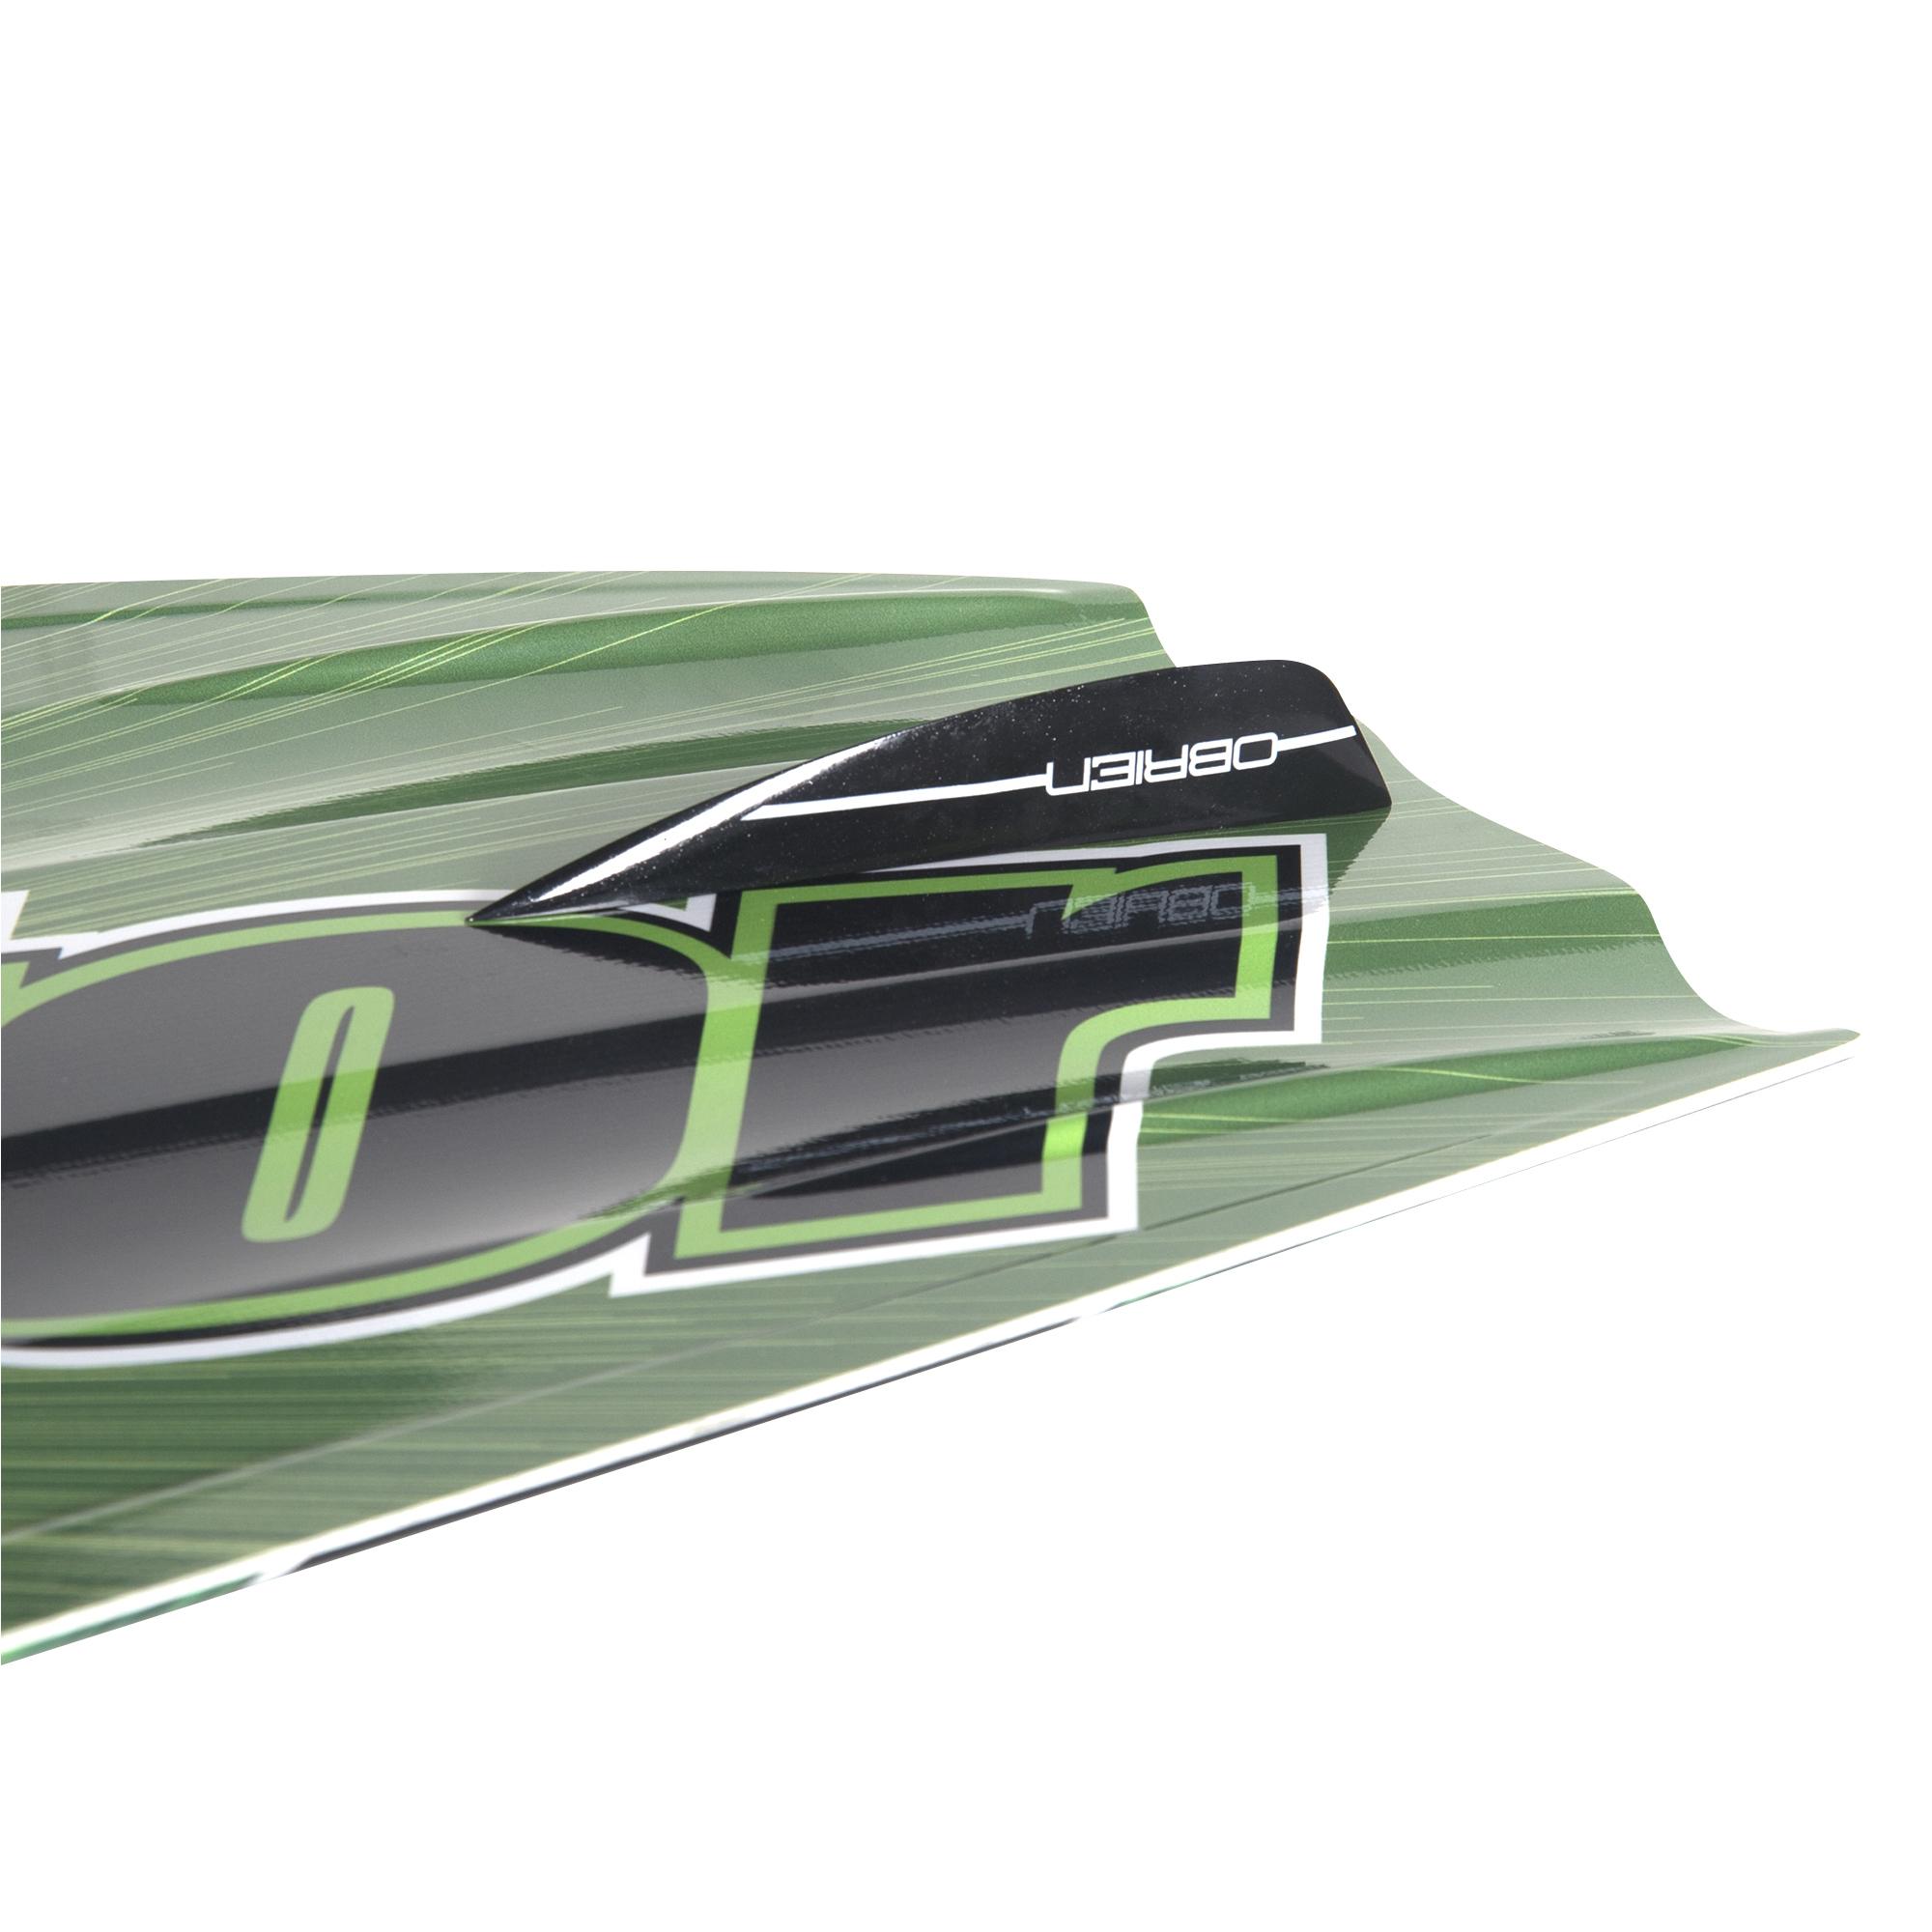 Gladiator Matrix Wakeboard With Clutch Bindings